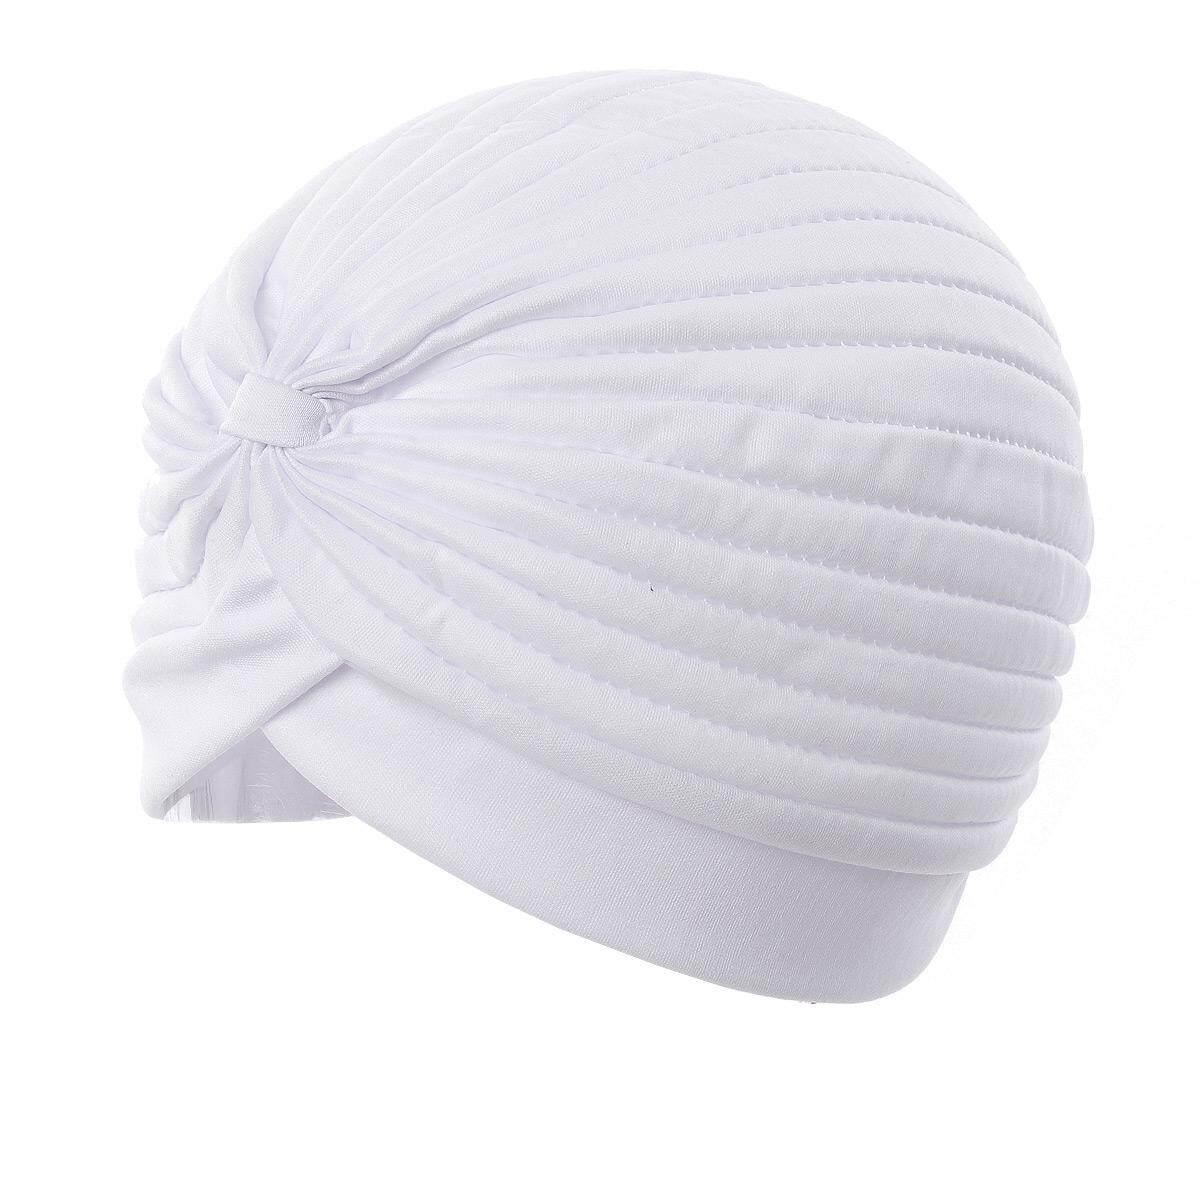 ... Topi Kupluk Wanita Fashion. Source · Sorban Twist Lipit Pembungkus  Rambut Stretch Turban Wanita Pembungkus Kepala Kover Tutup 520e7d7021